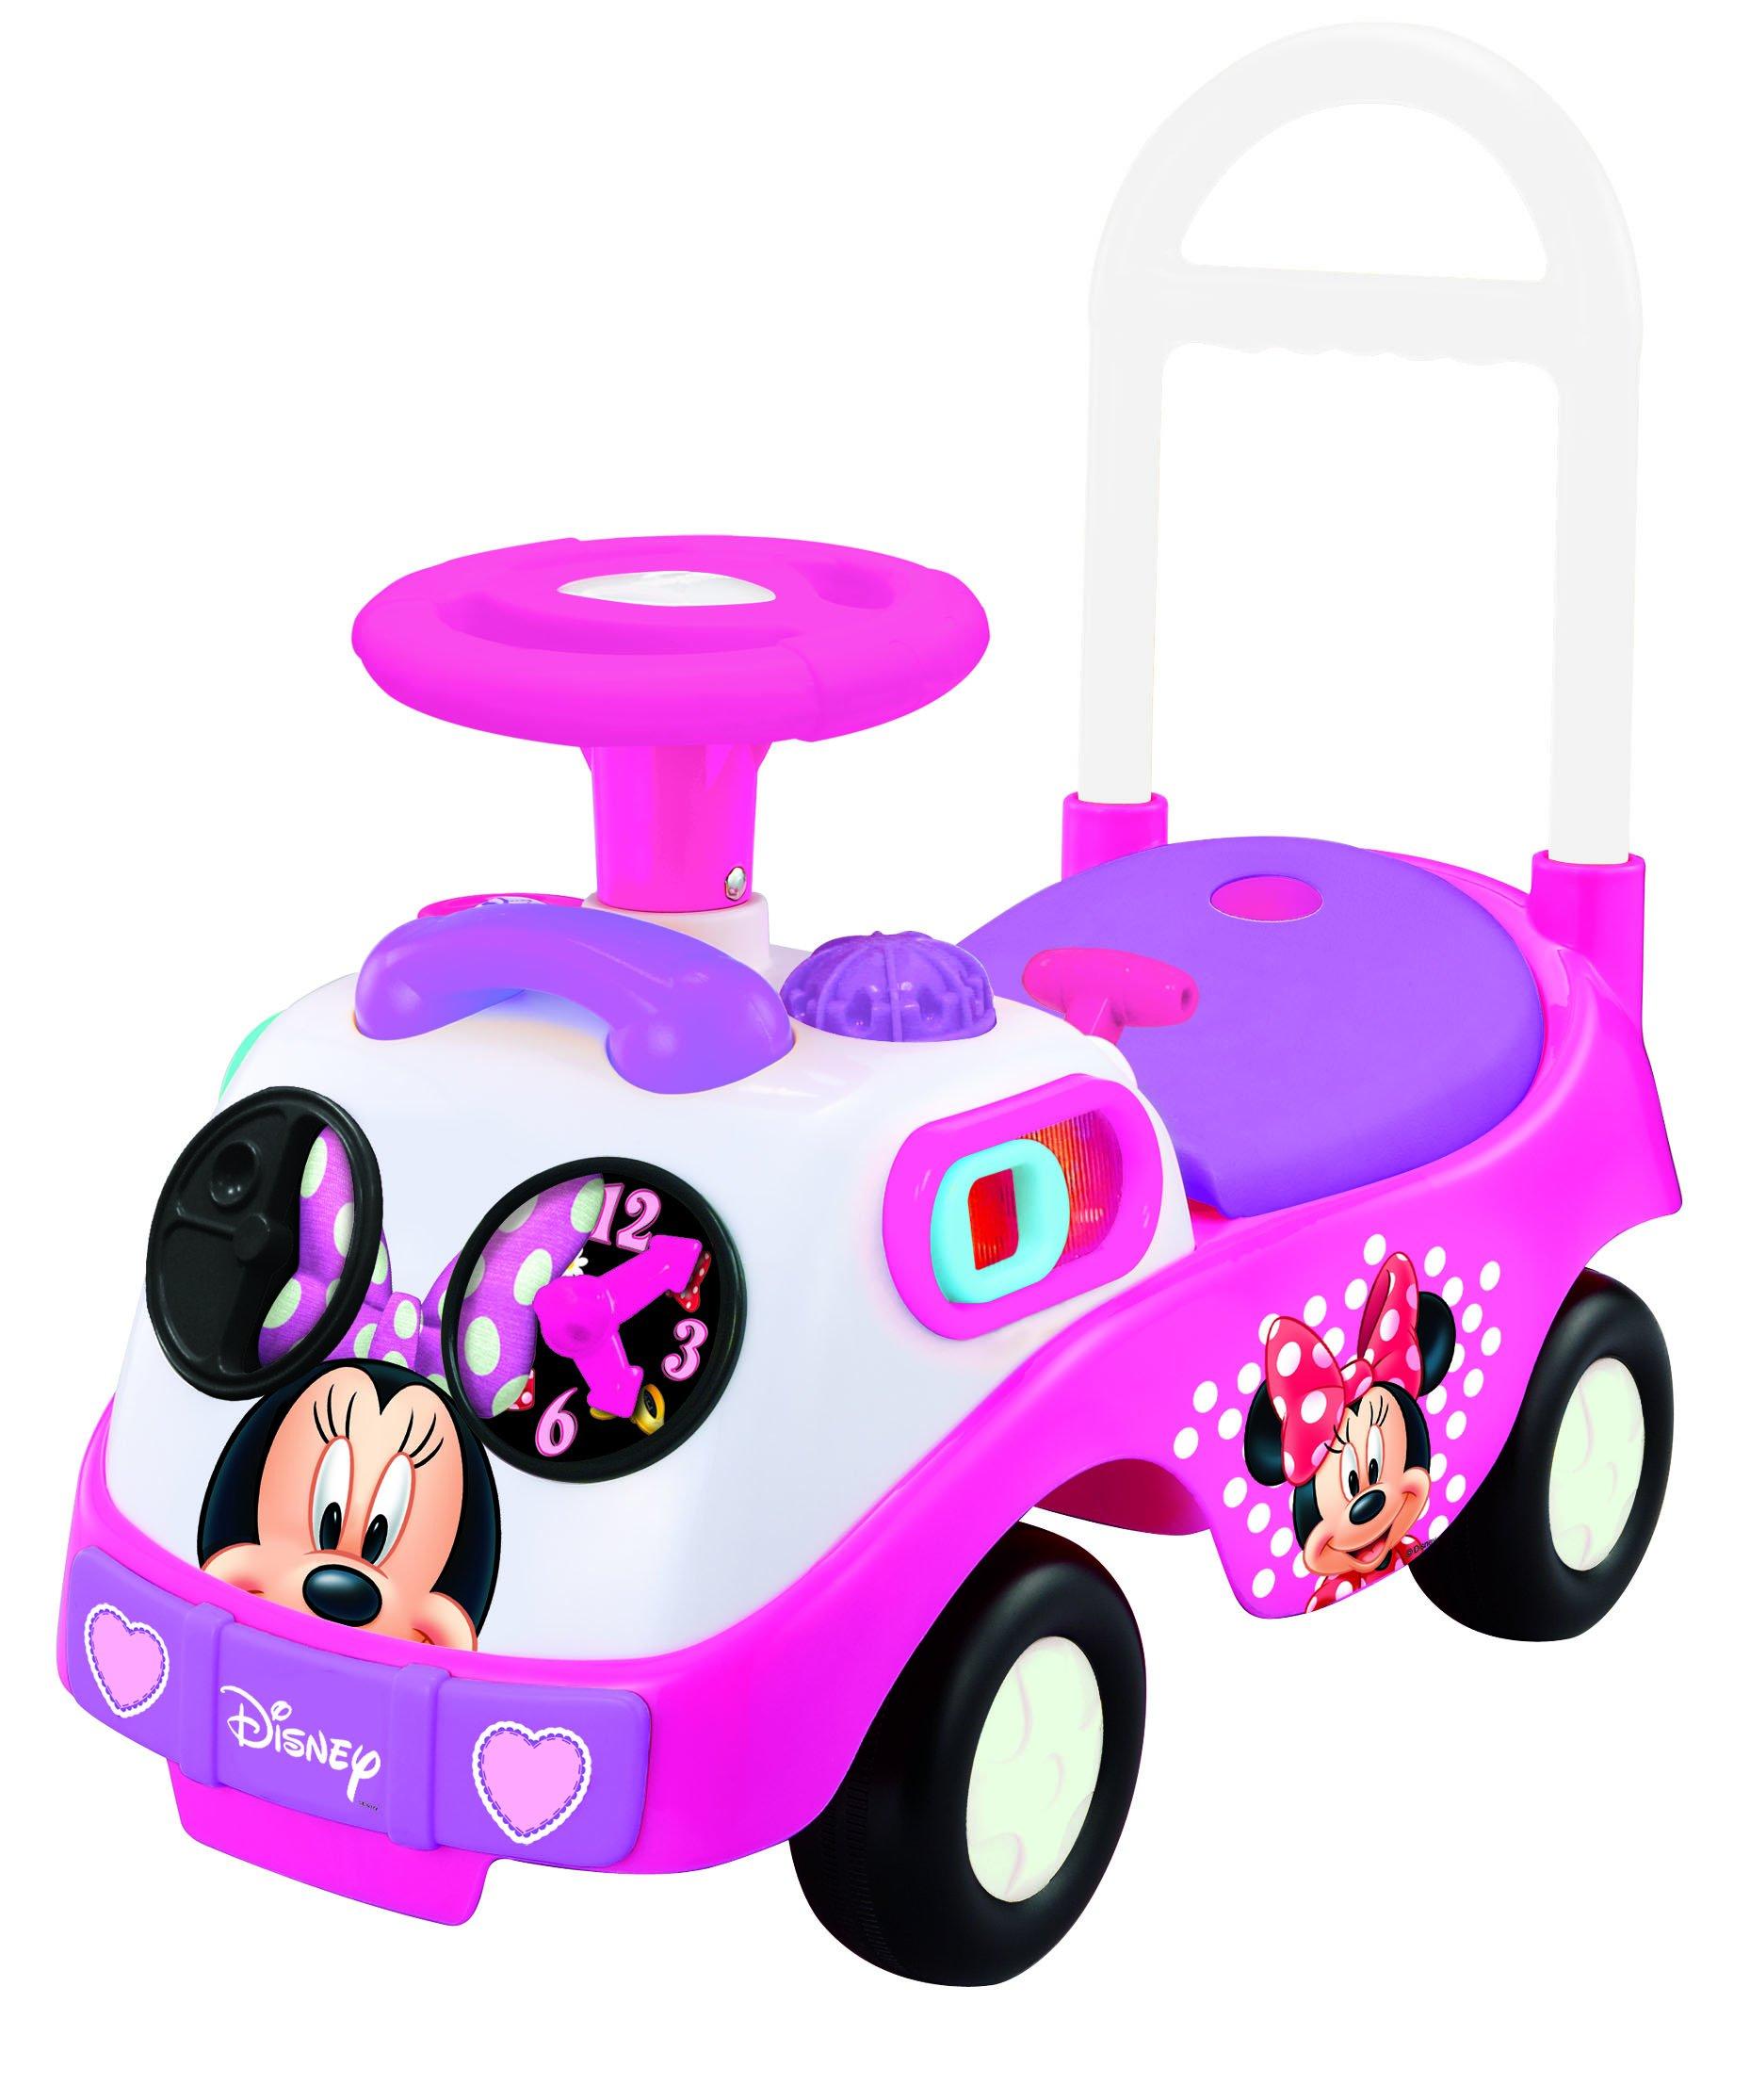 Kiddieland My First Minnie Ride On by Kiddieland Toys Limited